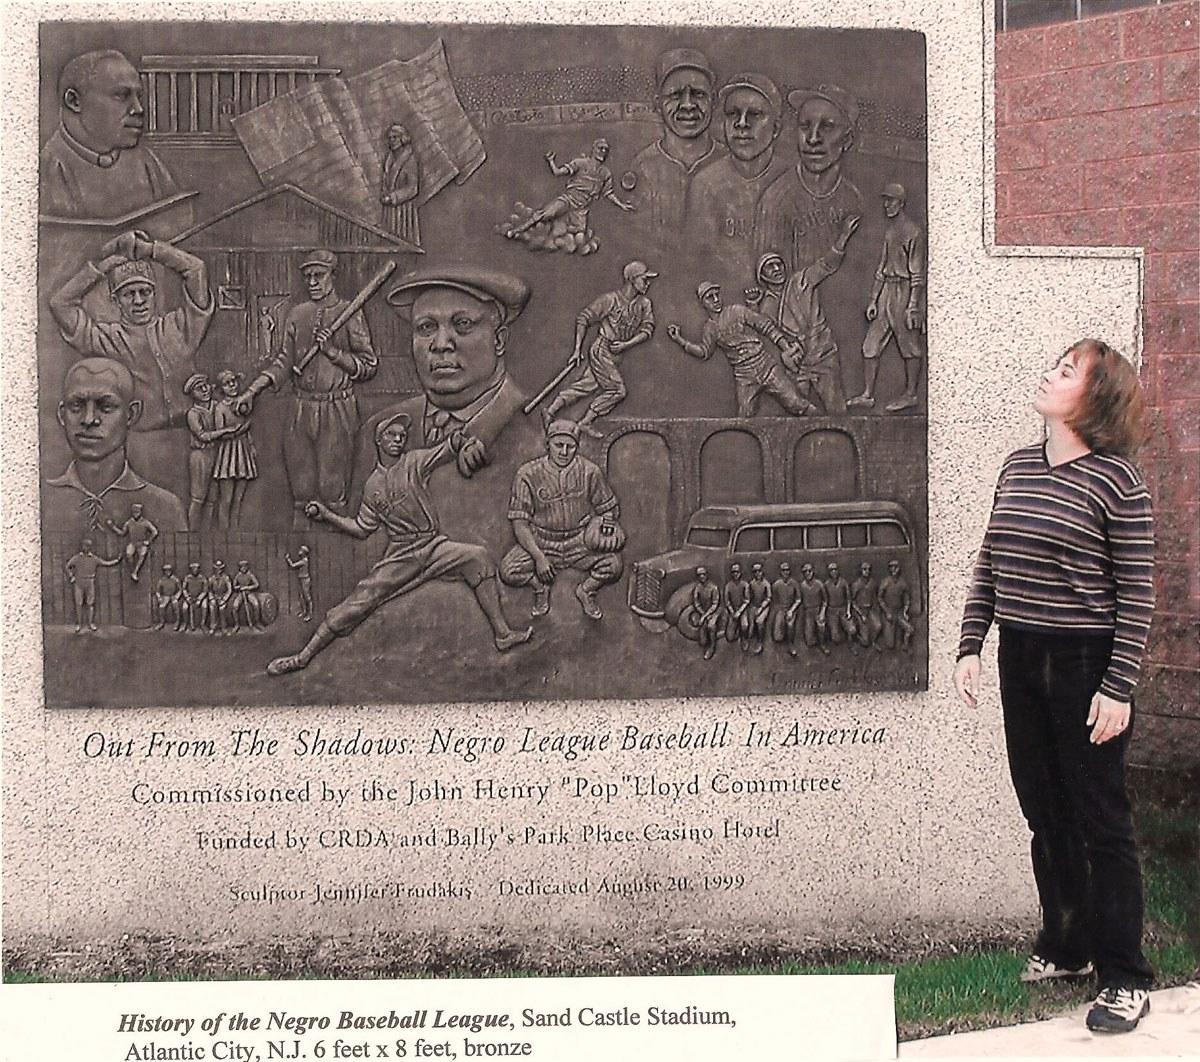 <p>Jennifer Frudakis-Petry with History of Negro Baseball League, 1999. Bronze. 6 x 8 feet. Stockton University Athletic Department, Egg Harbor, NJ. Image courtesy of the artist.</p>